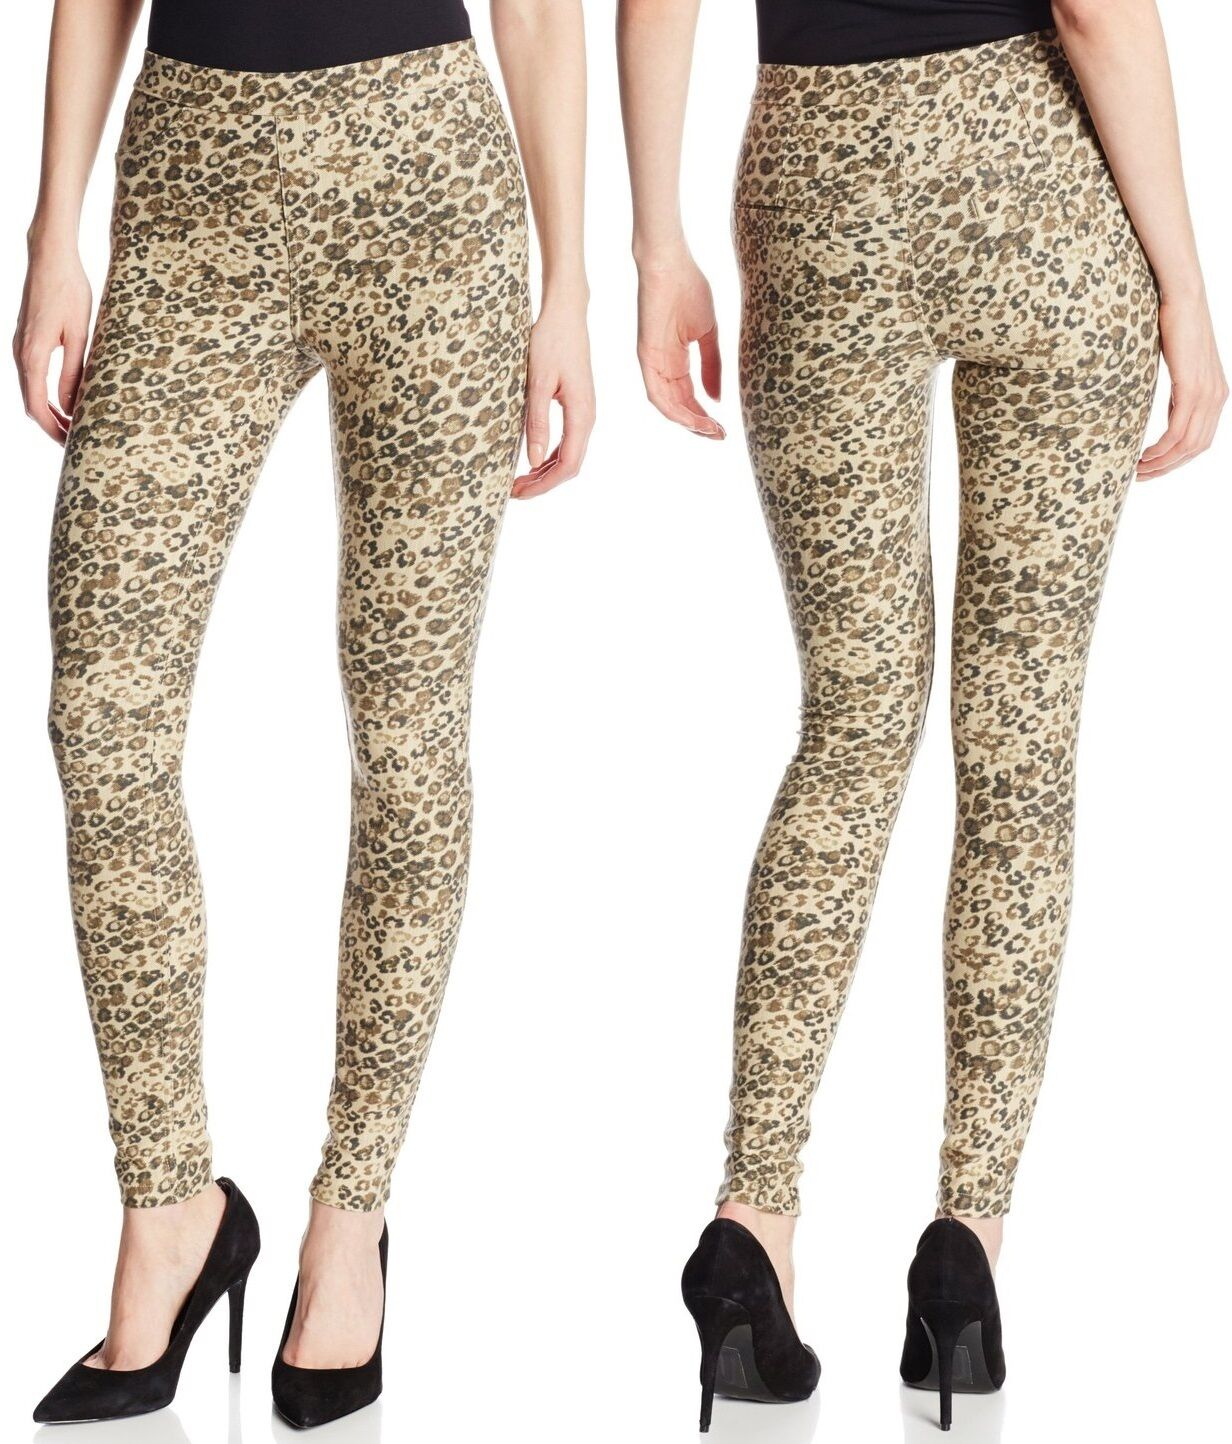 MSRP $44 HUE U14277 Chinos Beige-Multi Leopard Soft Stretch Twill Leggings